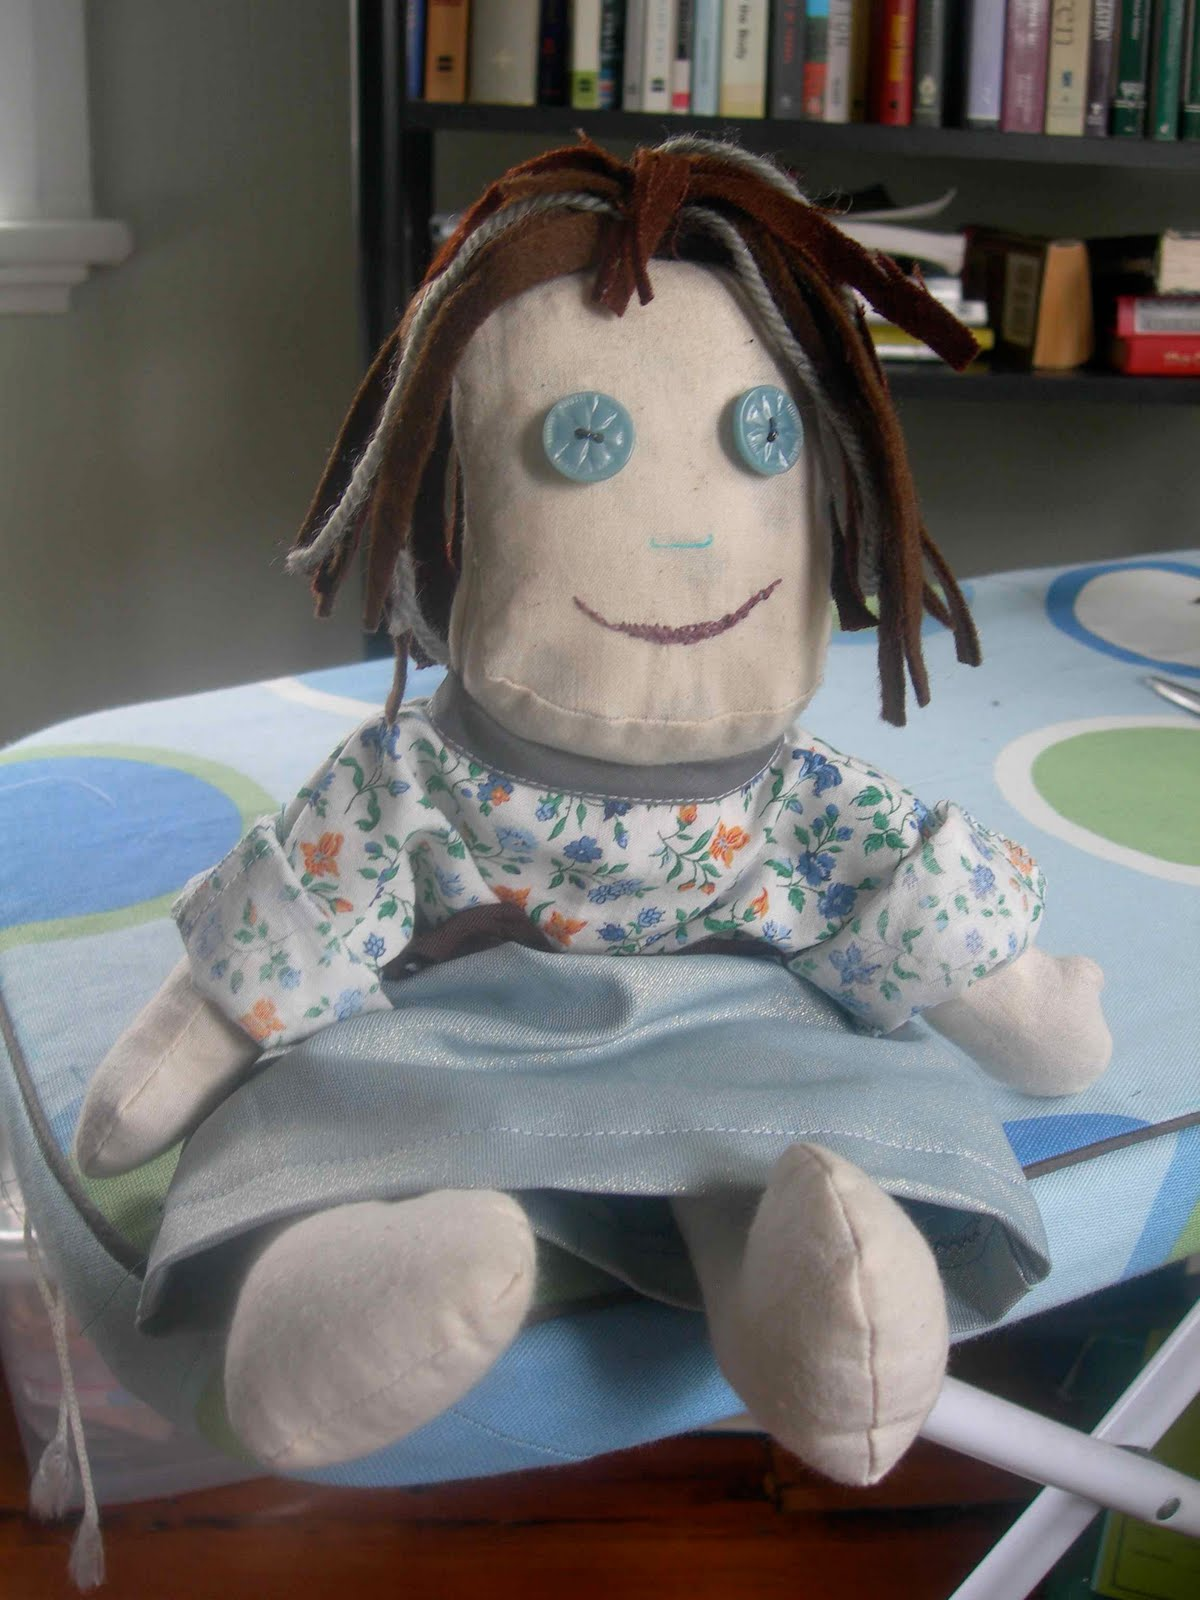 Beth Parson's Toy